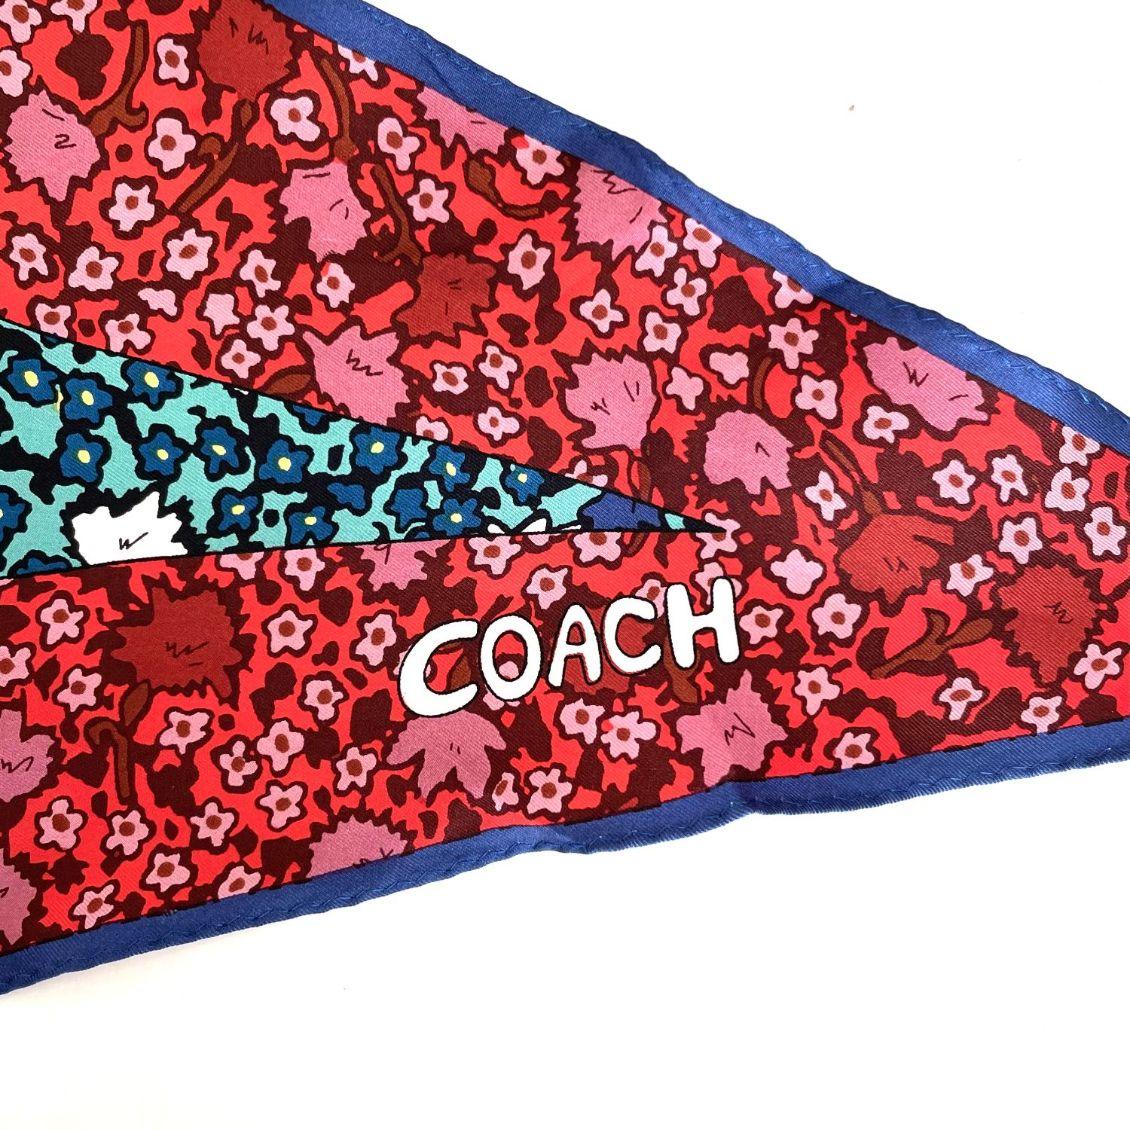 Lenço Coach Floral